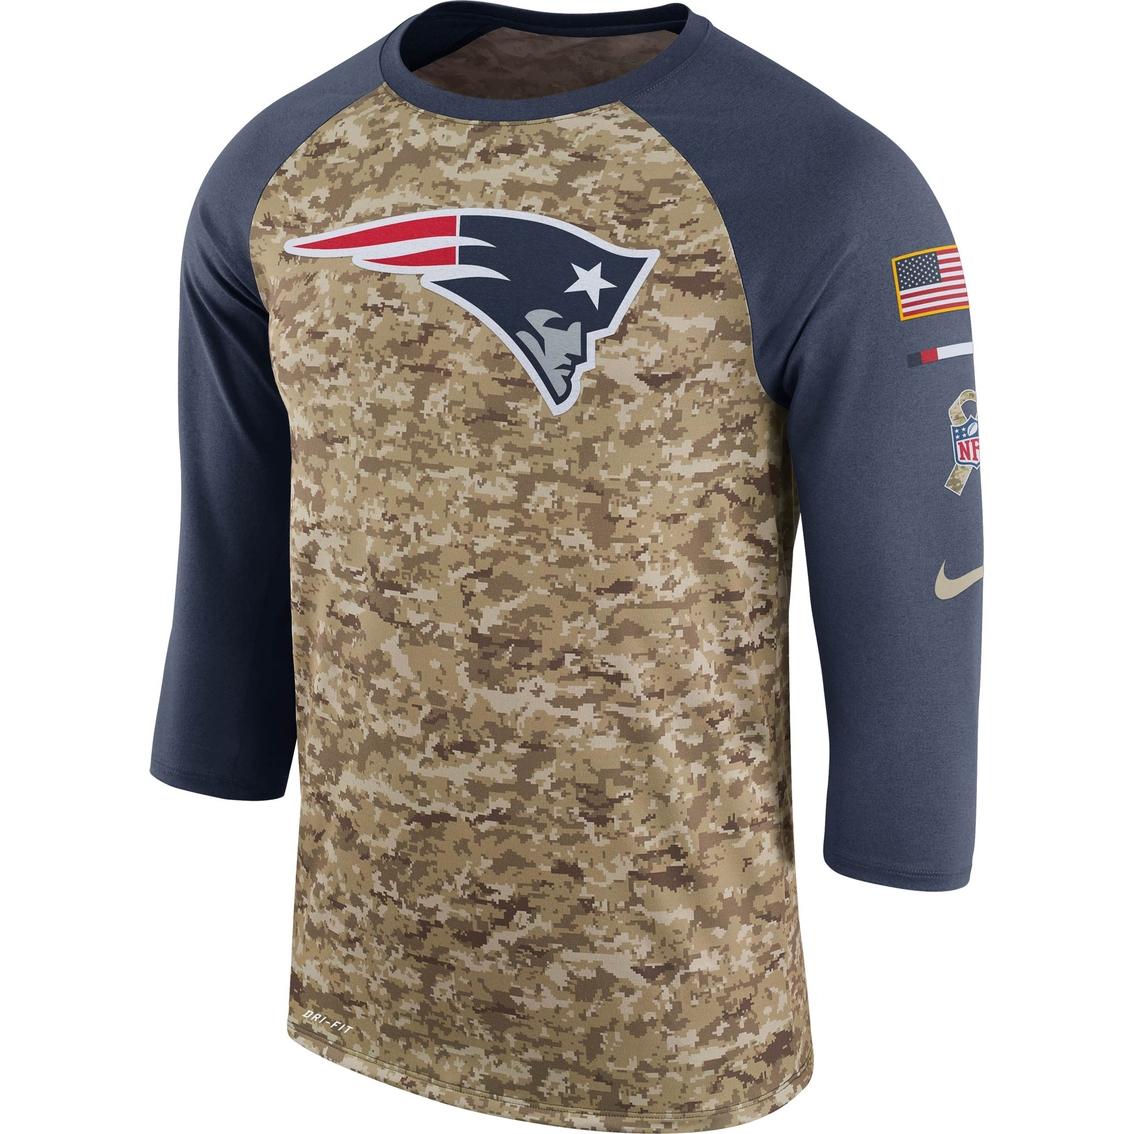 meet a2a55 591d8 Nike Nfl New England Patriots Salute To Service Raglan Tee ...